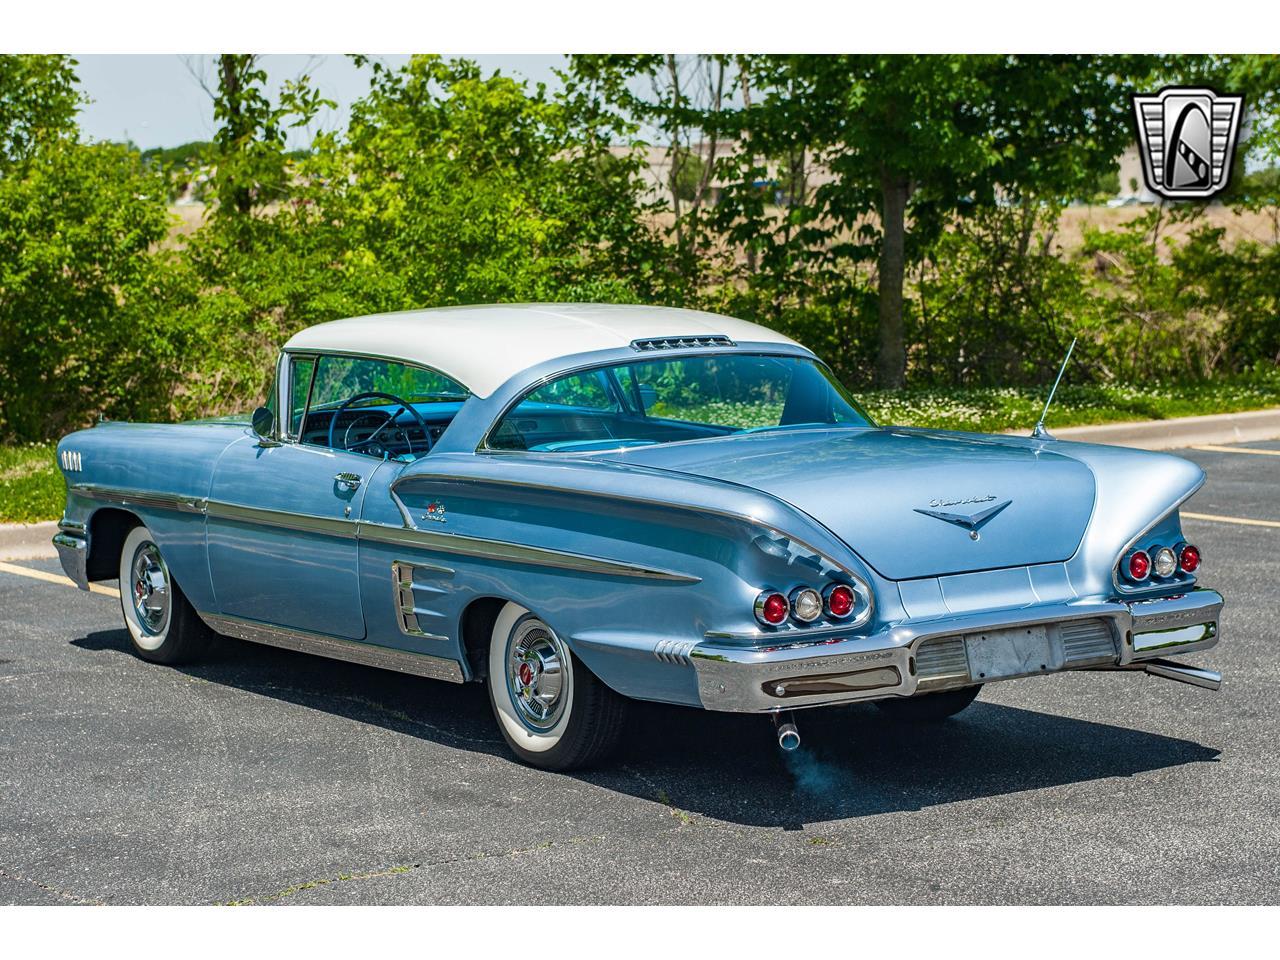 Large Picture of '58 Chevrolet Impala located in Illinois - QB9Q